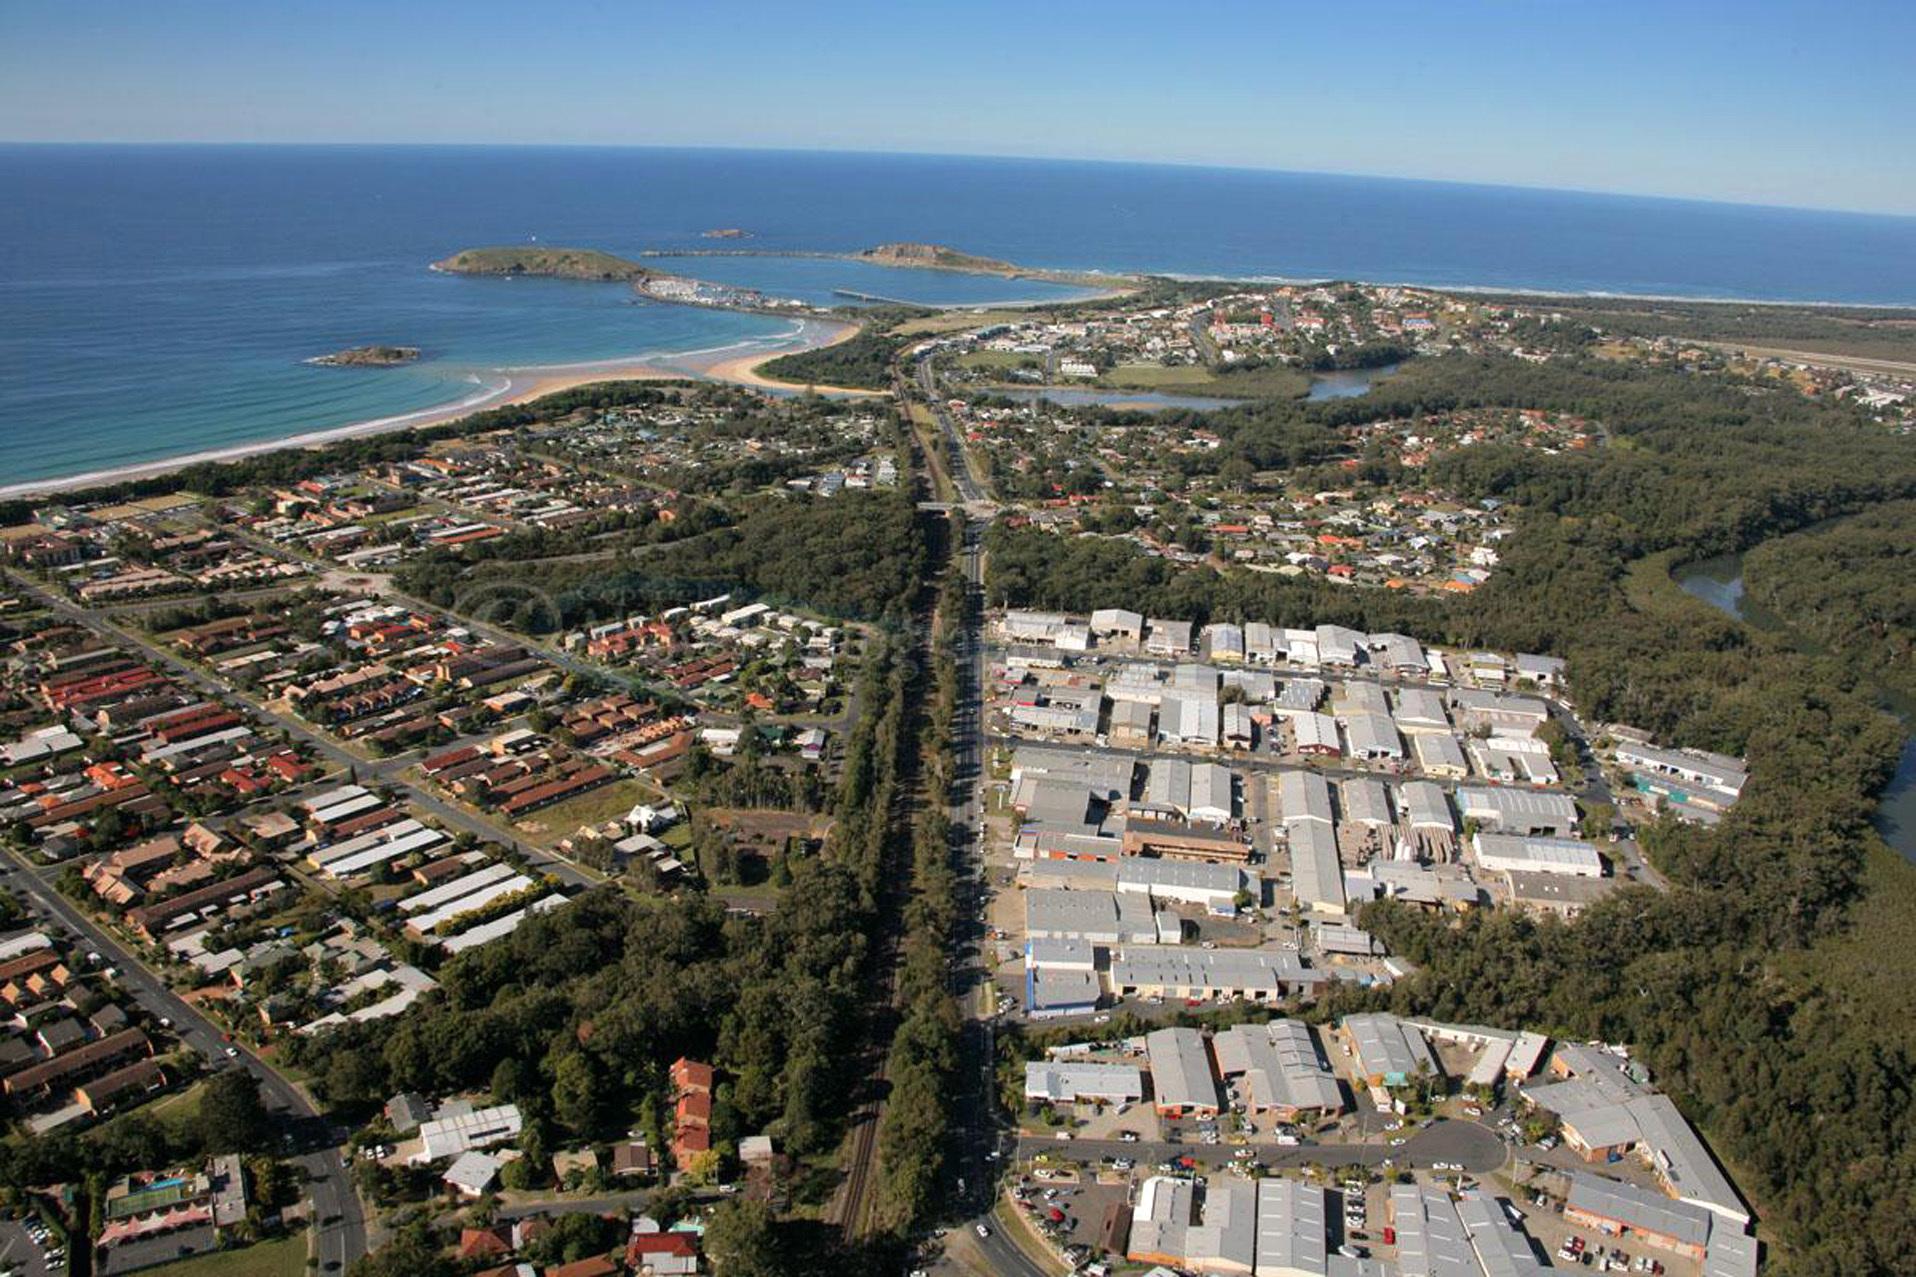 c - Oilman Coffs Harbour